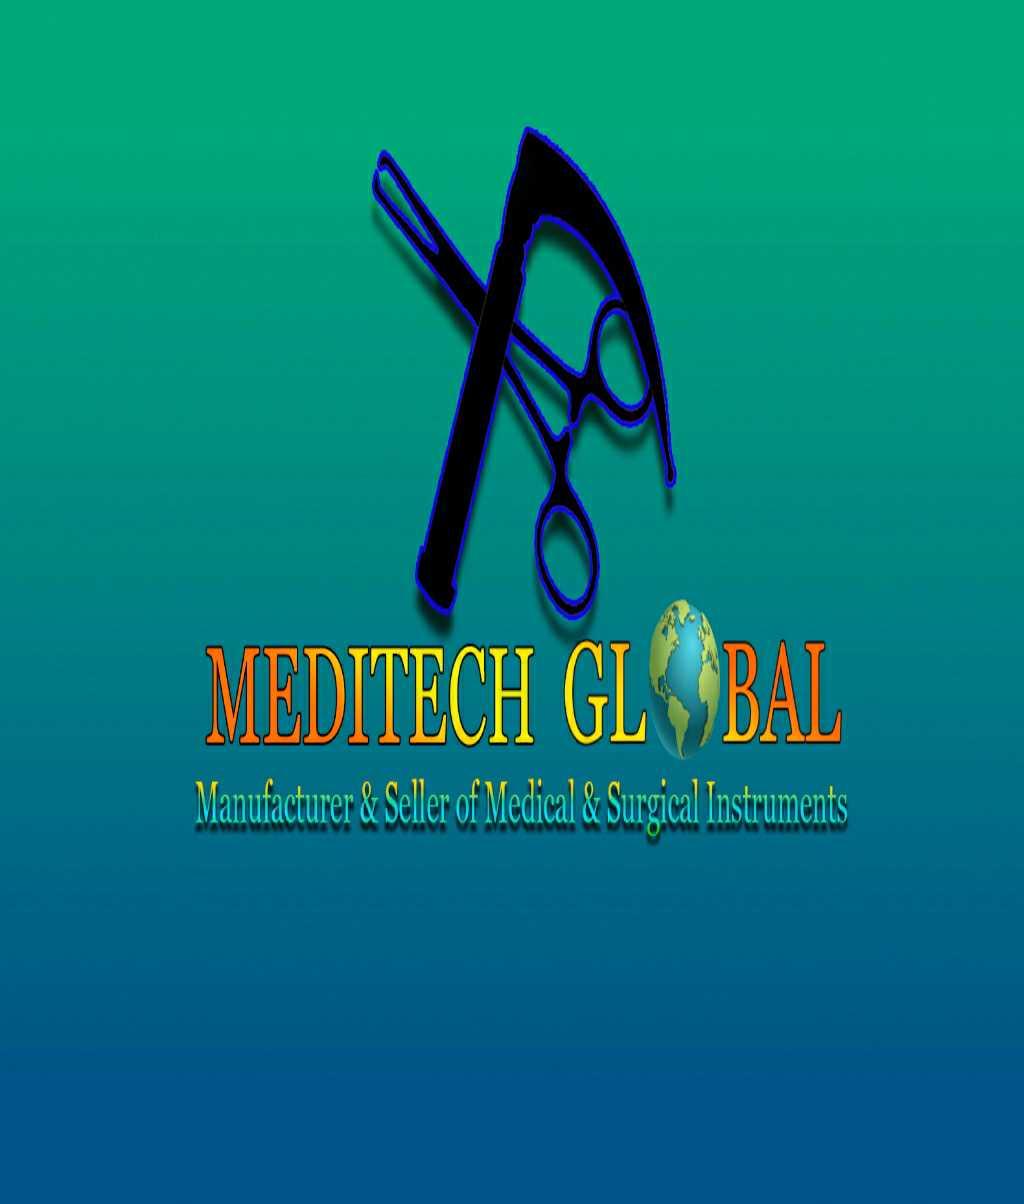 MEDITECH GLOBAL